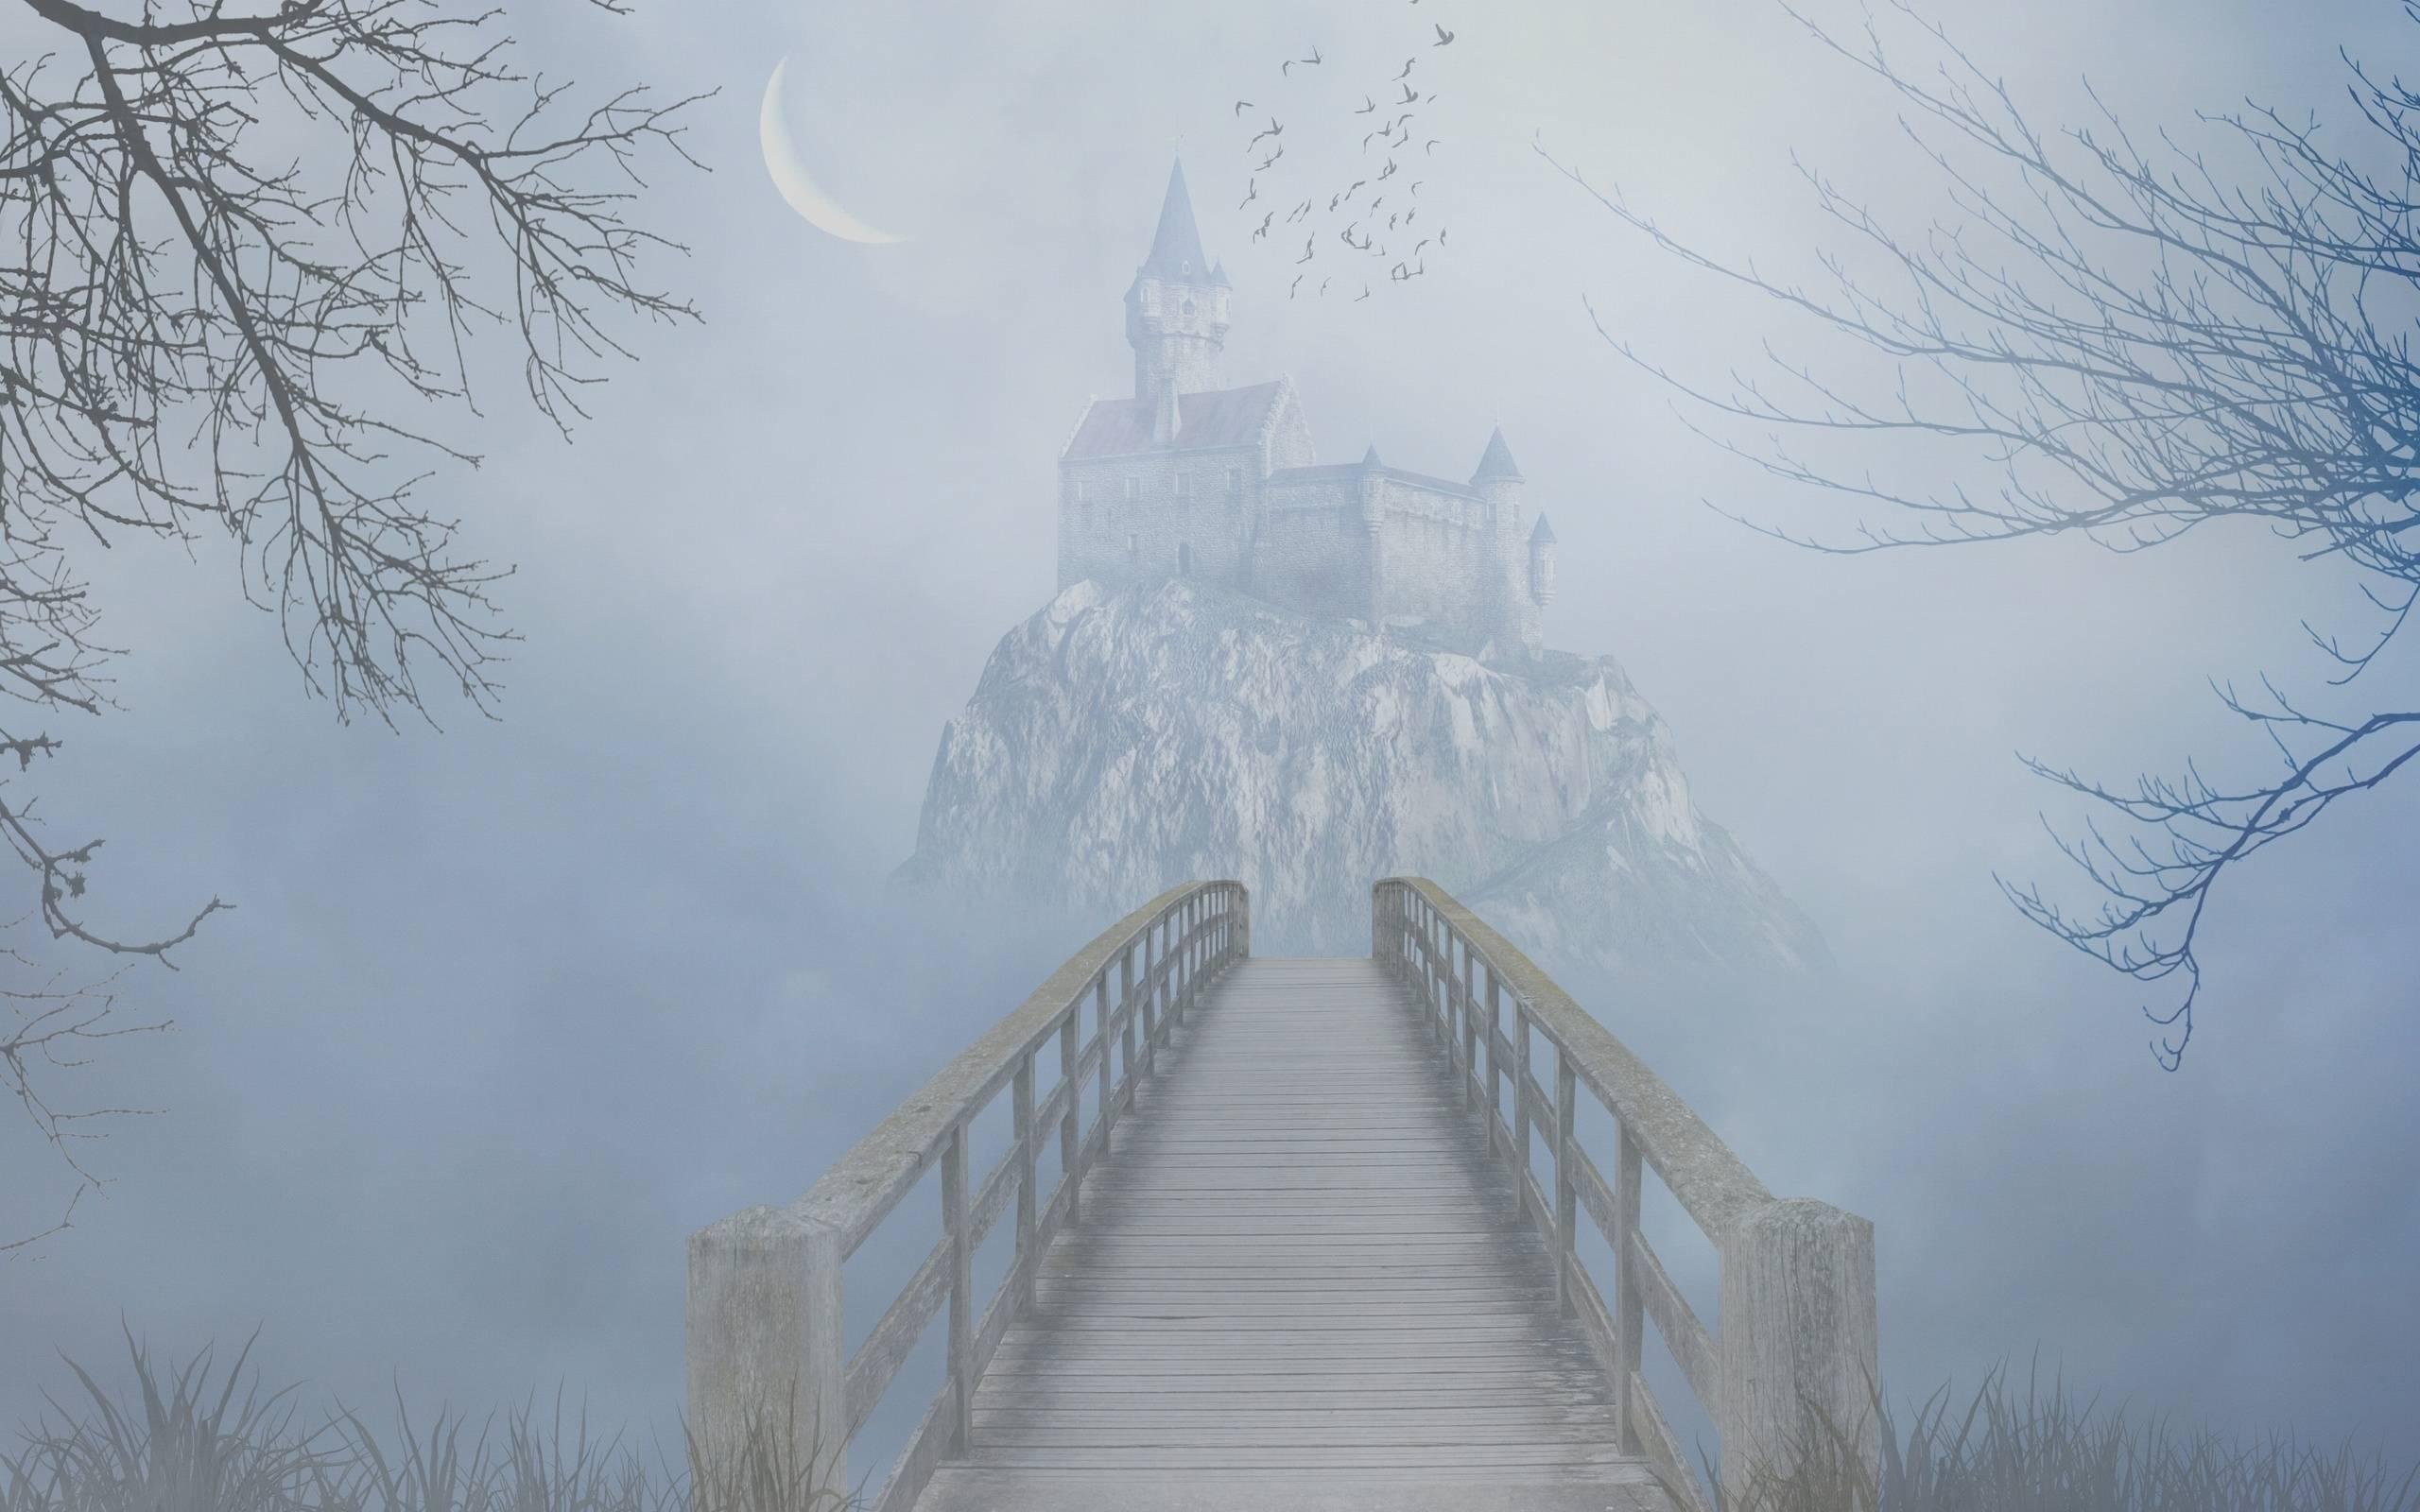 обои мостик, путь к замку, туман, месяц картинки фото